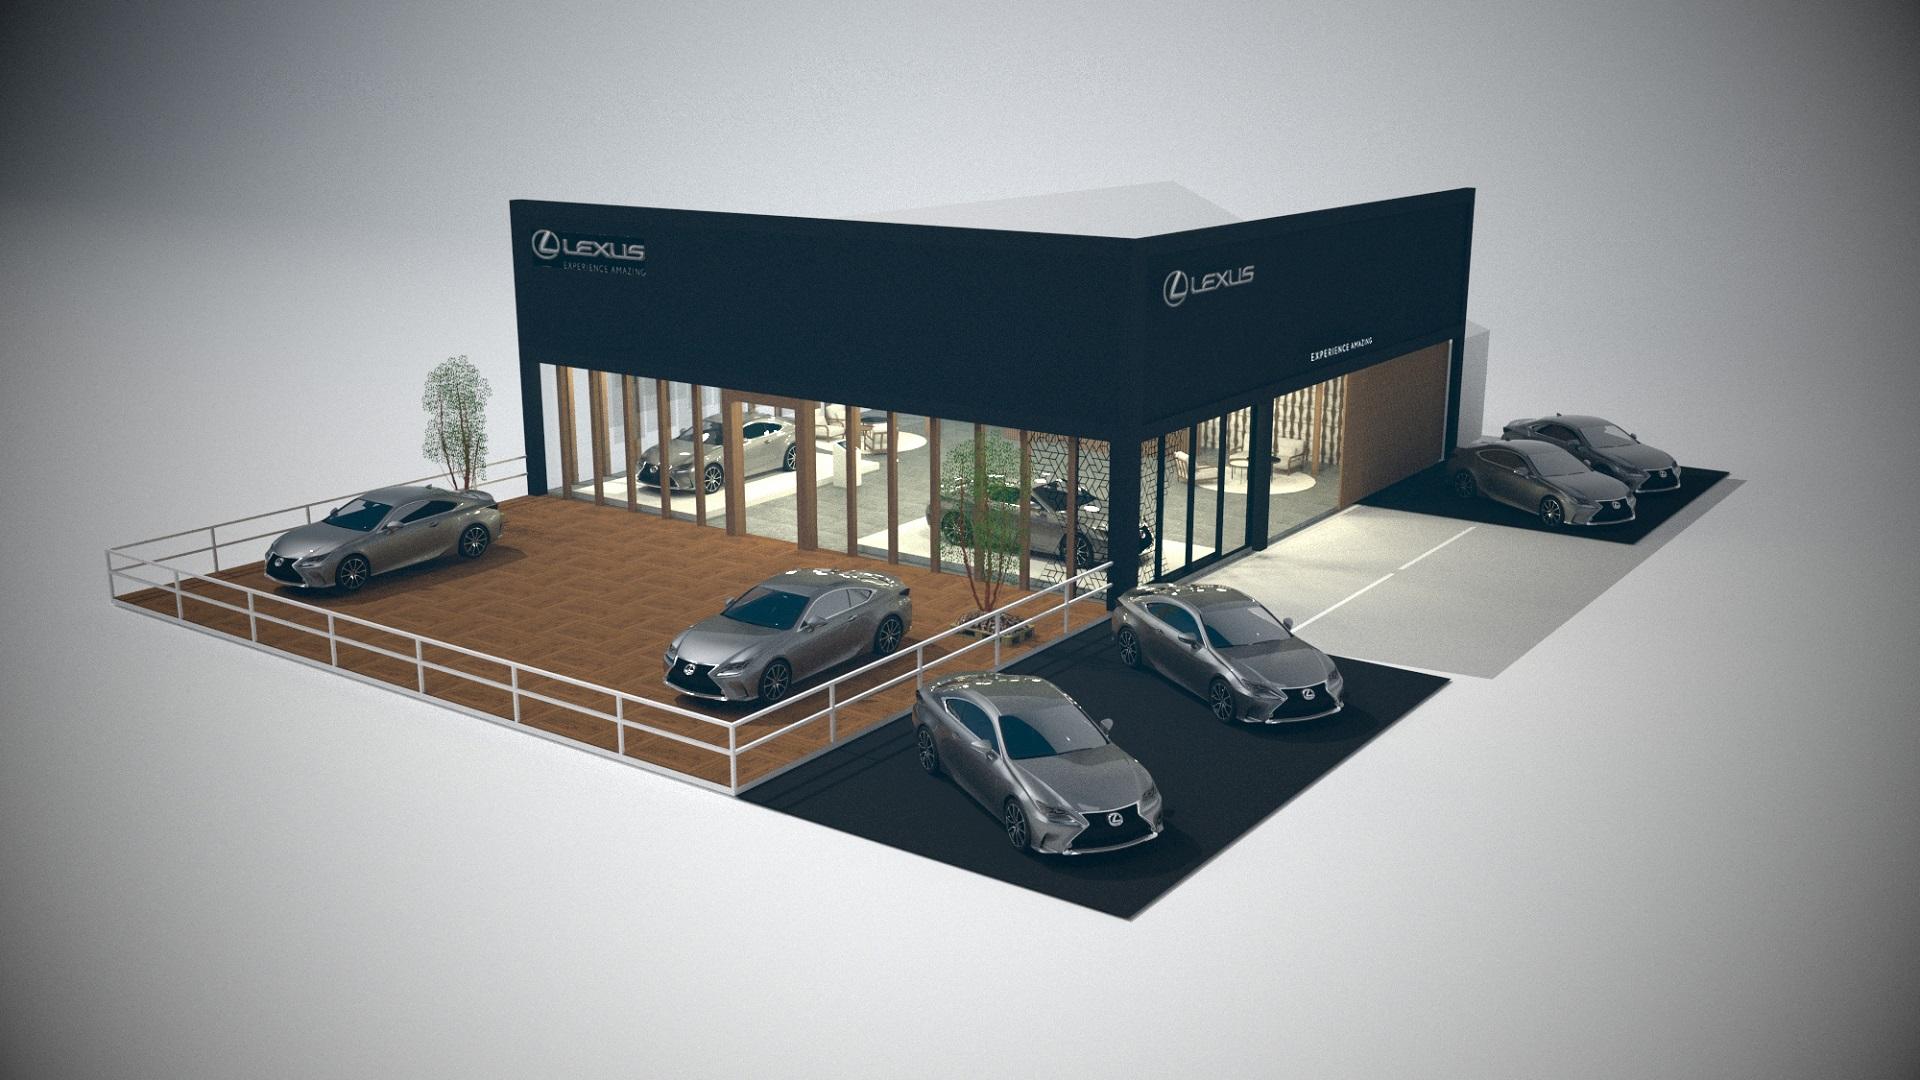 knokke le zoute grand prix lexus belgique. Black Bedroom Furniture Sets. Home Design Ideas